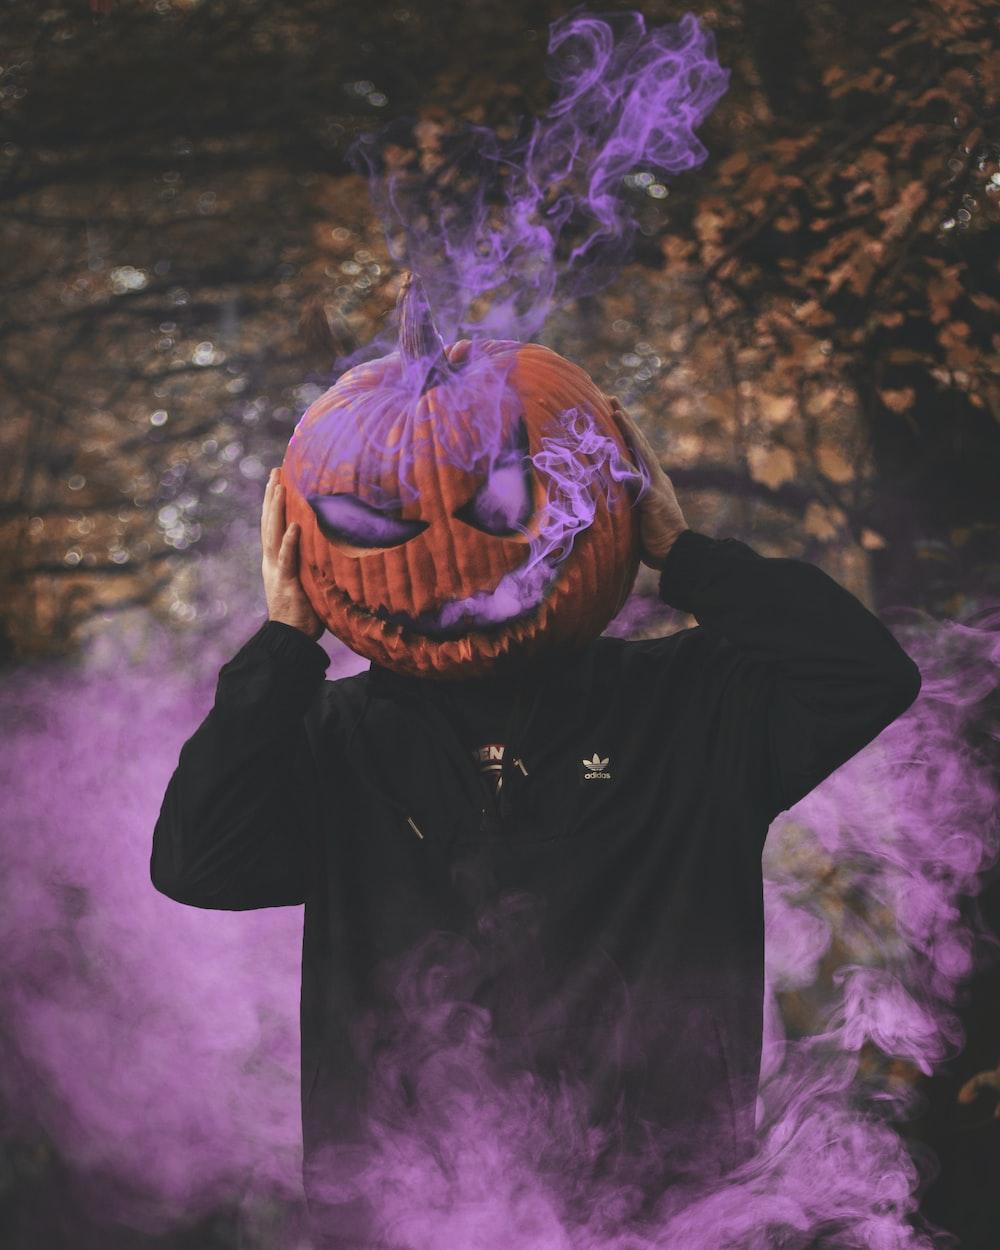 Halloween Wallpapers: Free HD Download [500+ HQ] | Unsplash